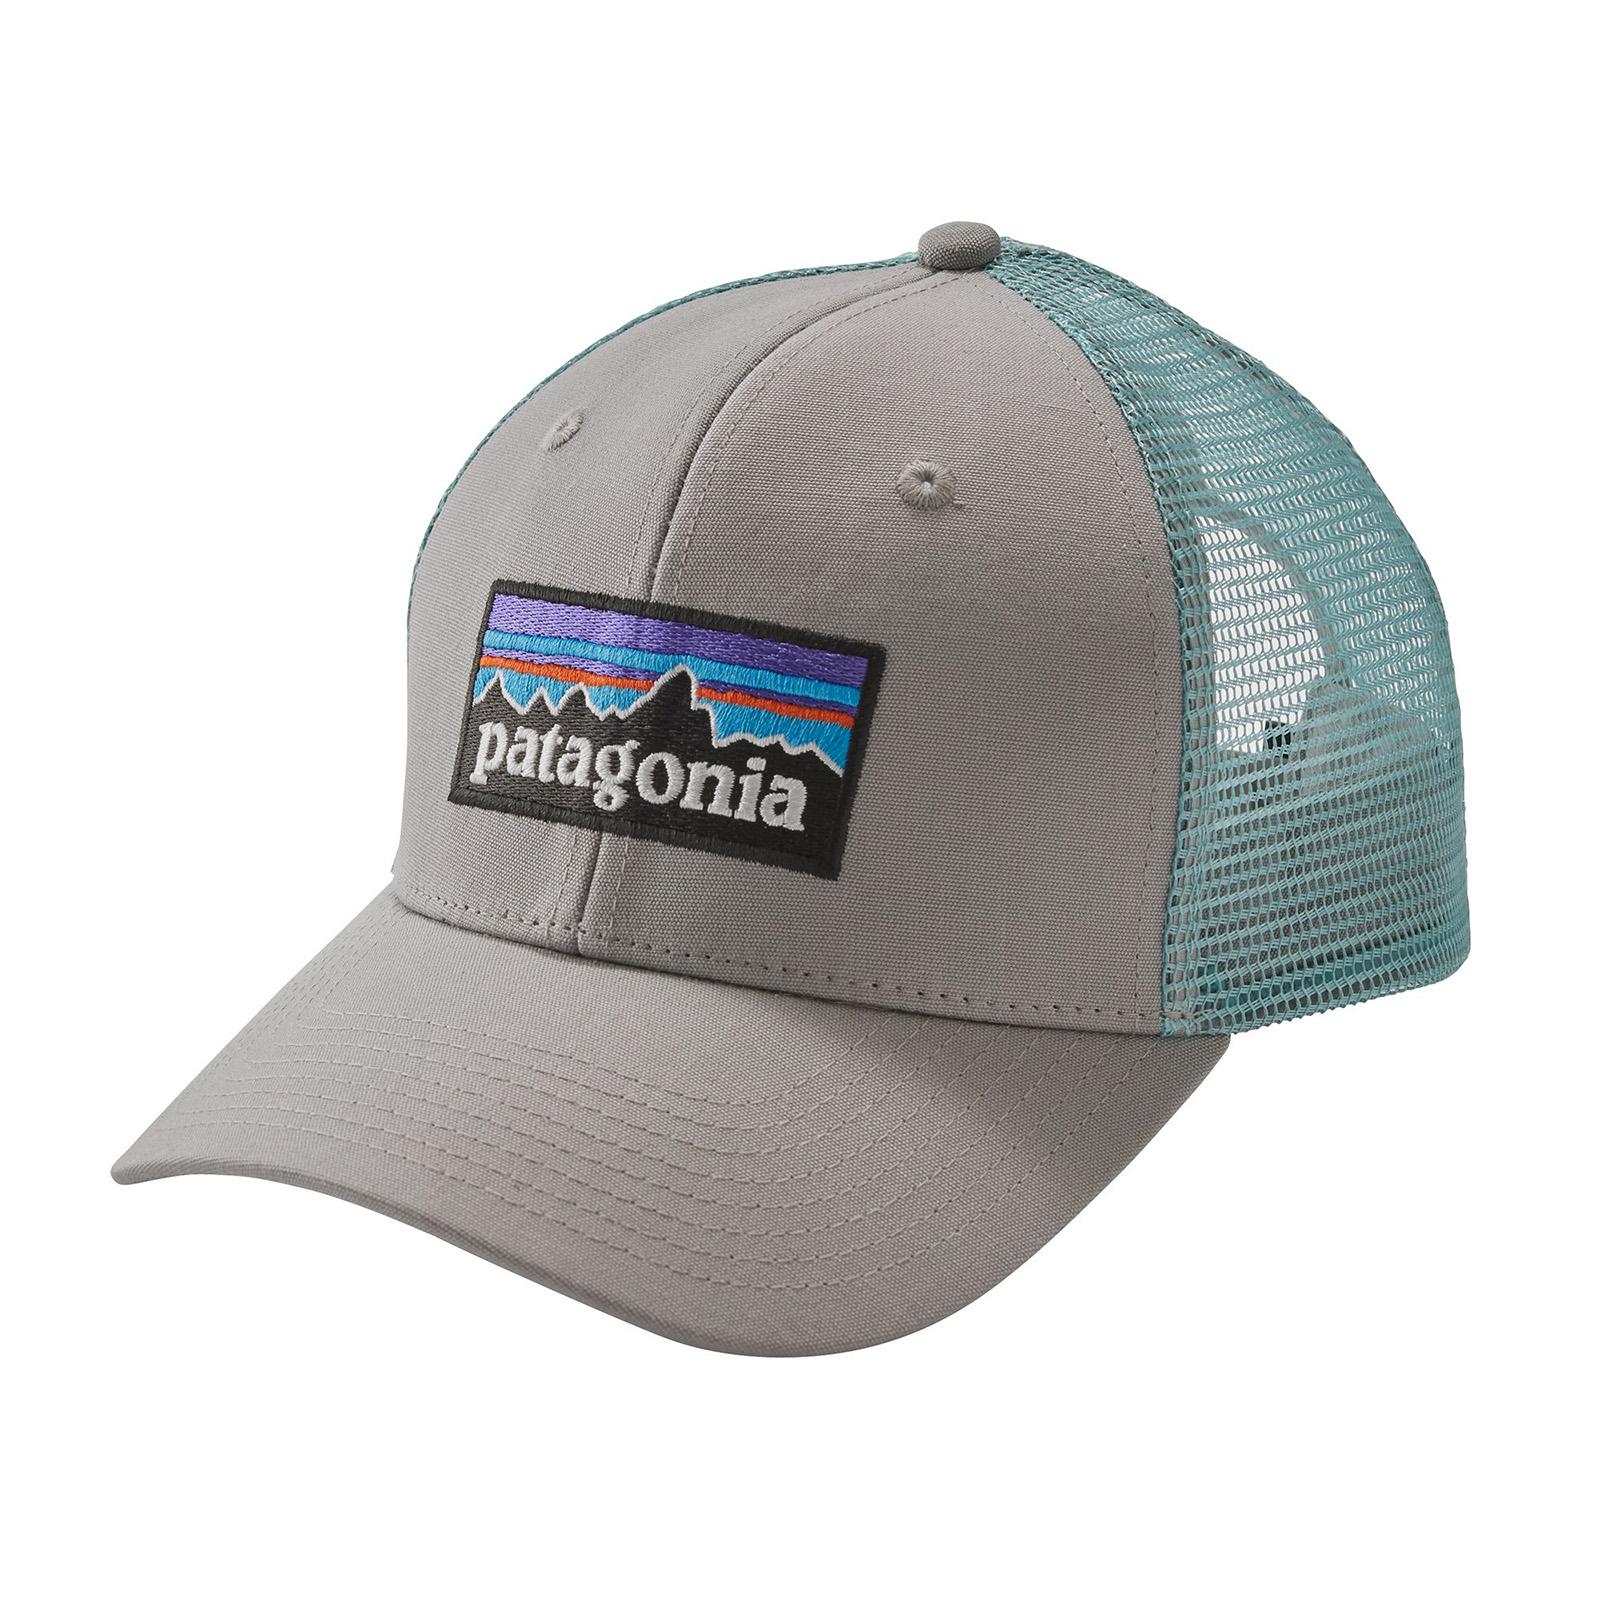 65d4665901c1d5 Patagonia P-6 Logo Trucker- Hat Drifter graue w/Dam blau Kappe ...